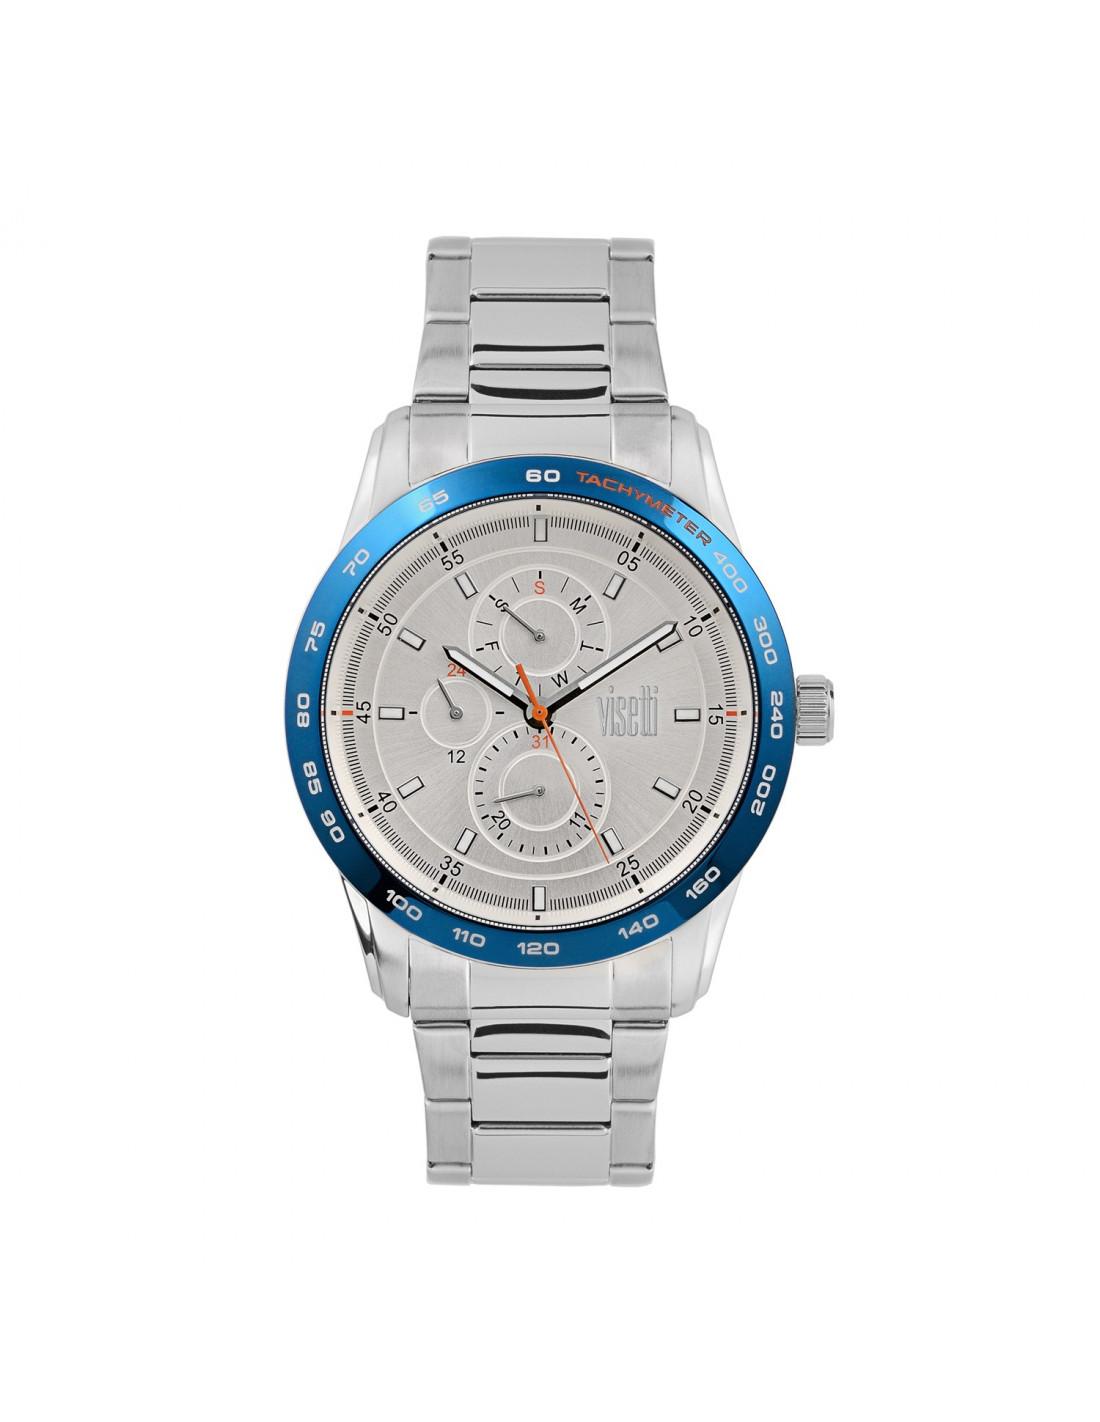 Men s wrist watch VISETTI Maverick PE684SC with stainless steel band b3732456949